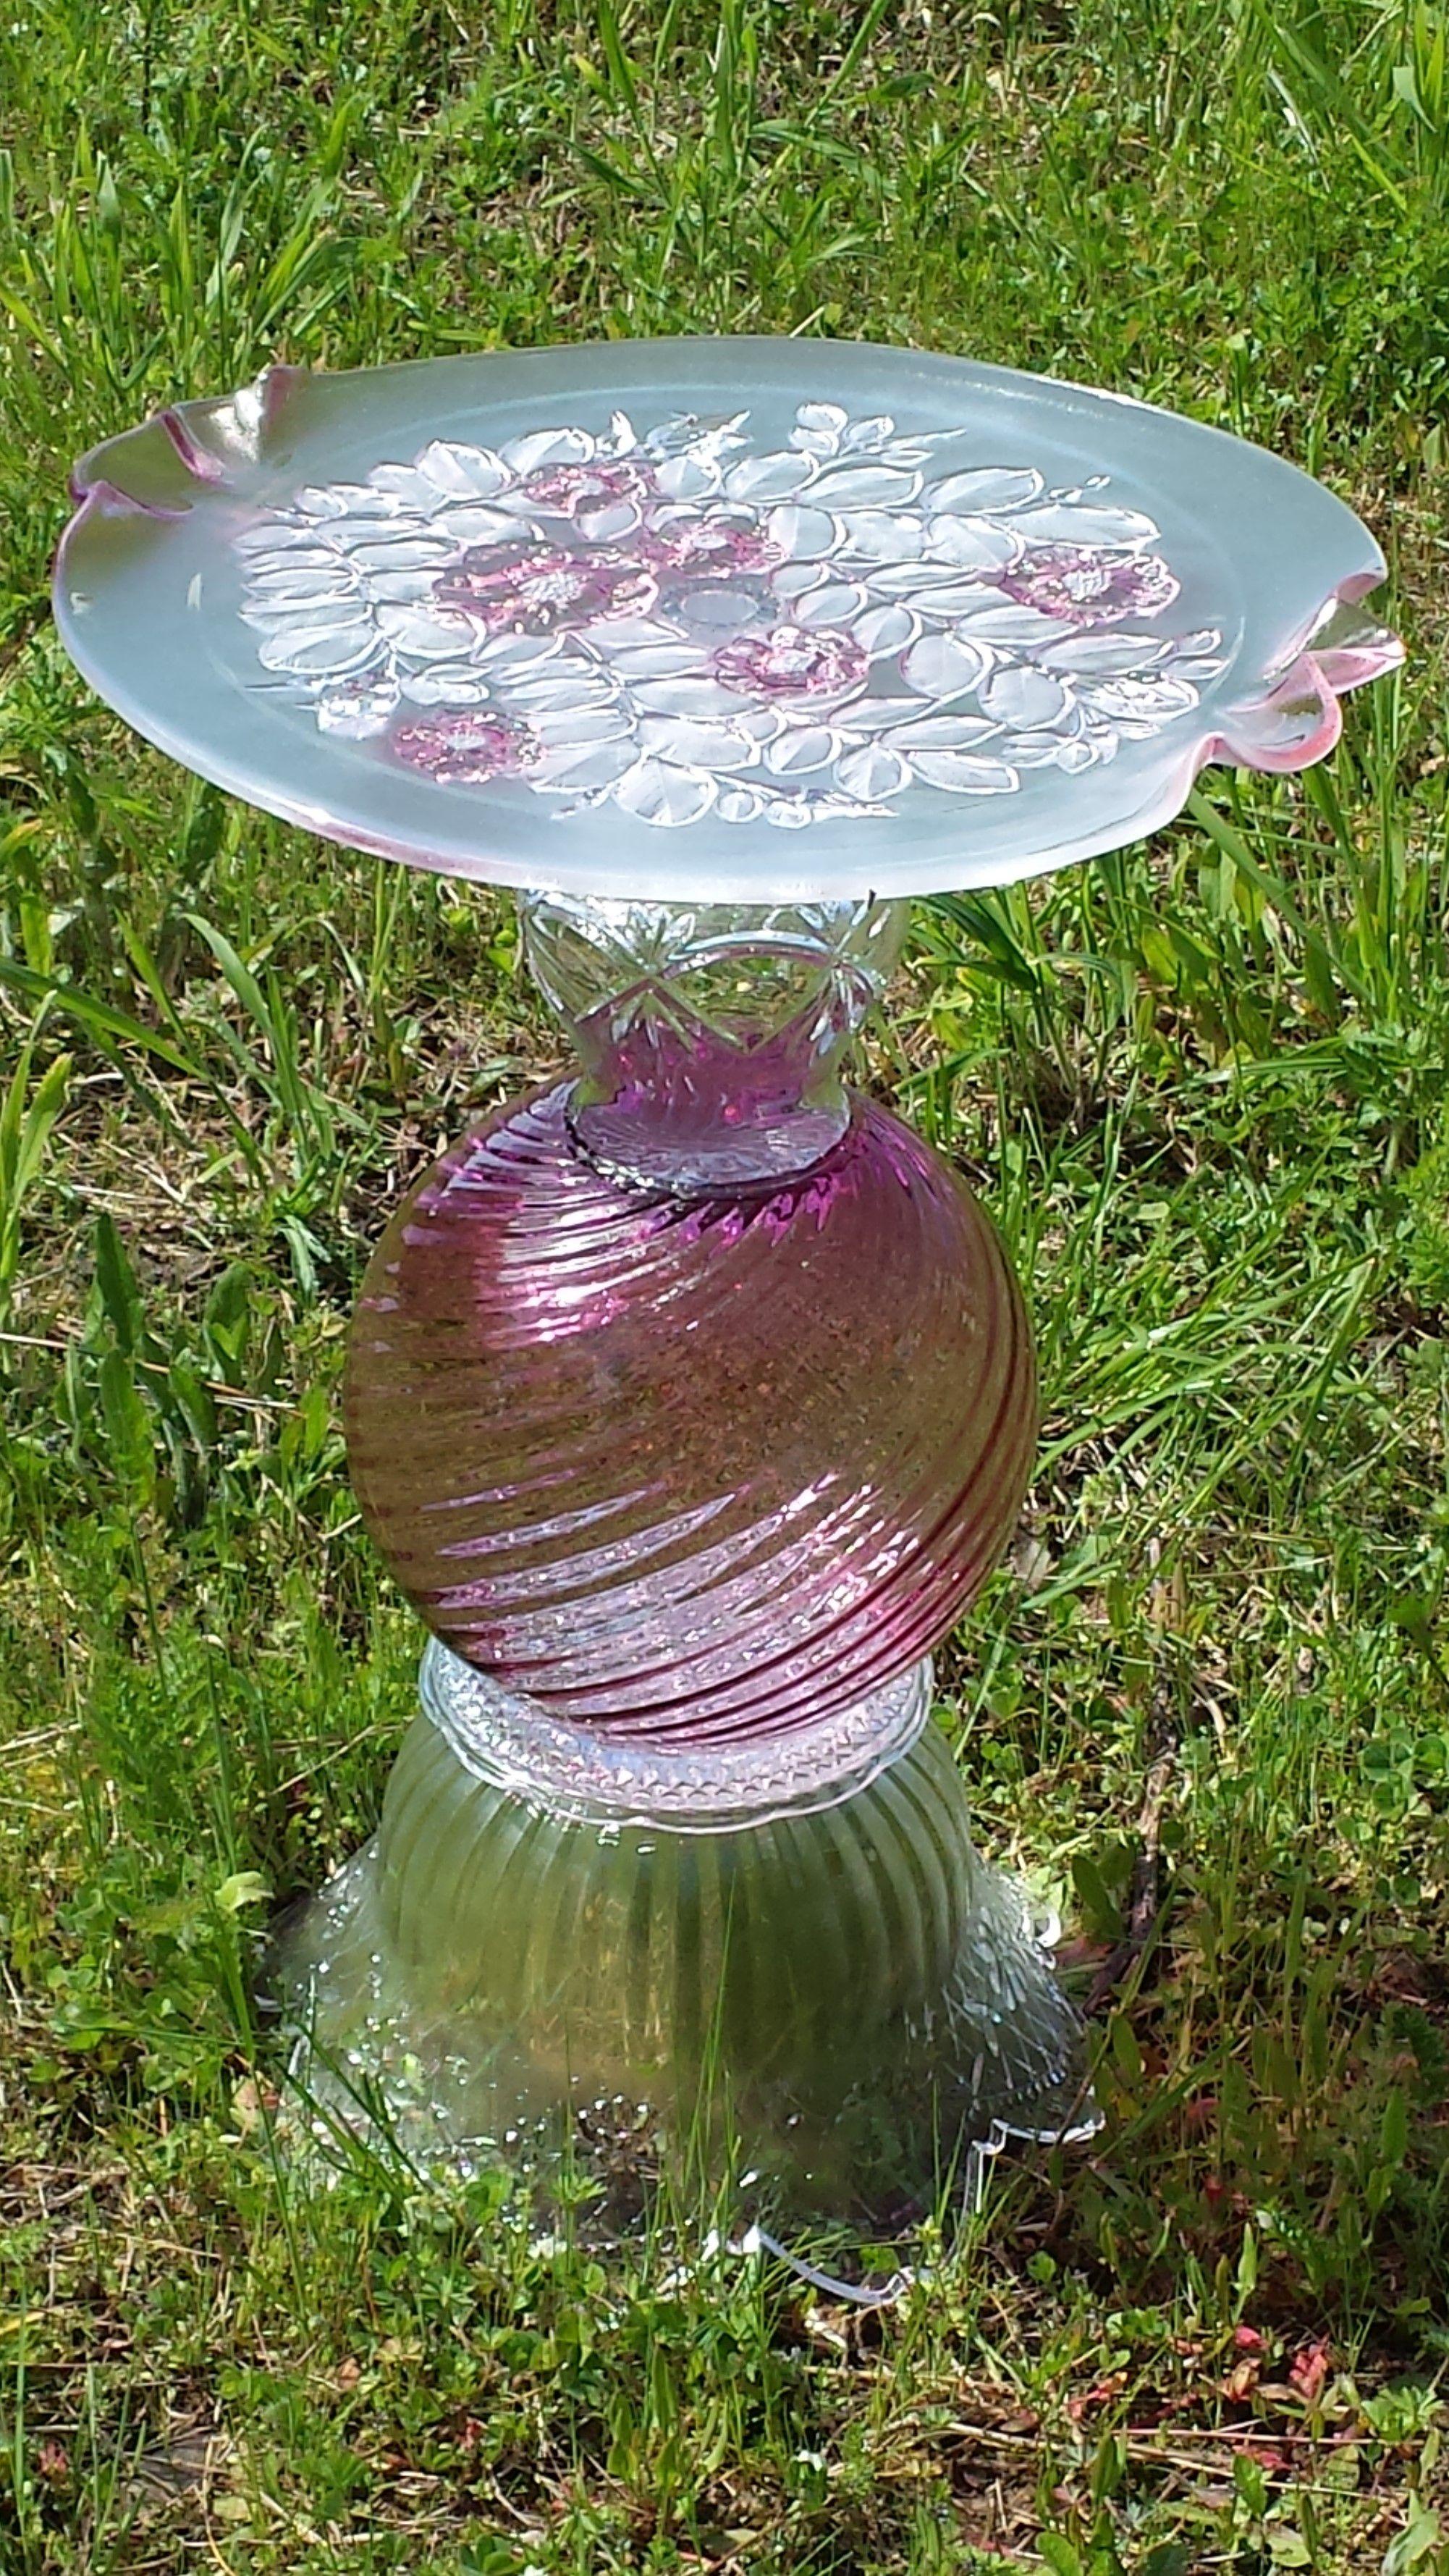 Glass yard art  Pin by FlamelessAndShameless on Yard Art  Pinterest  Garden art